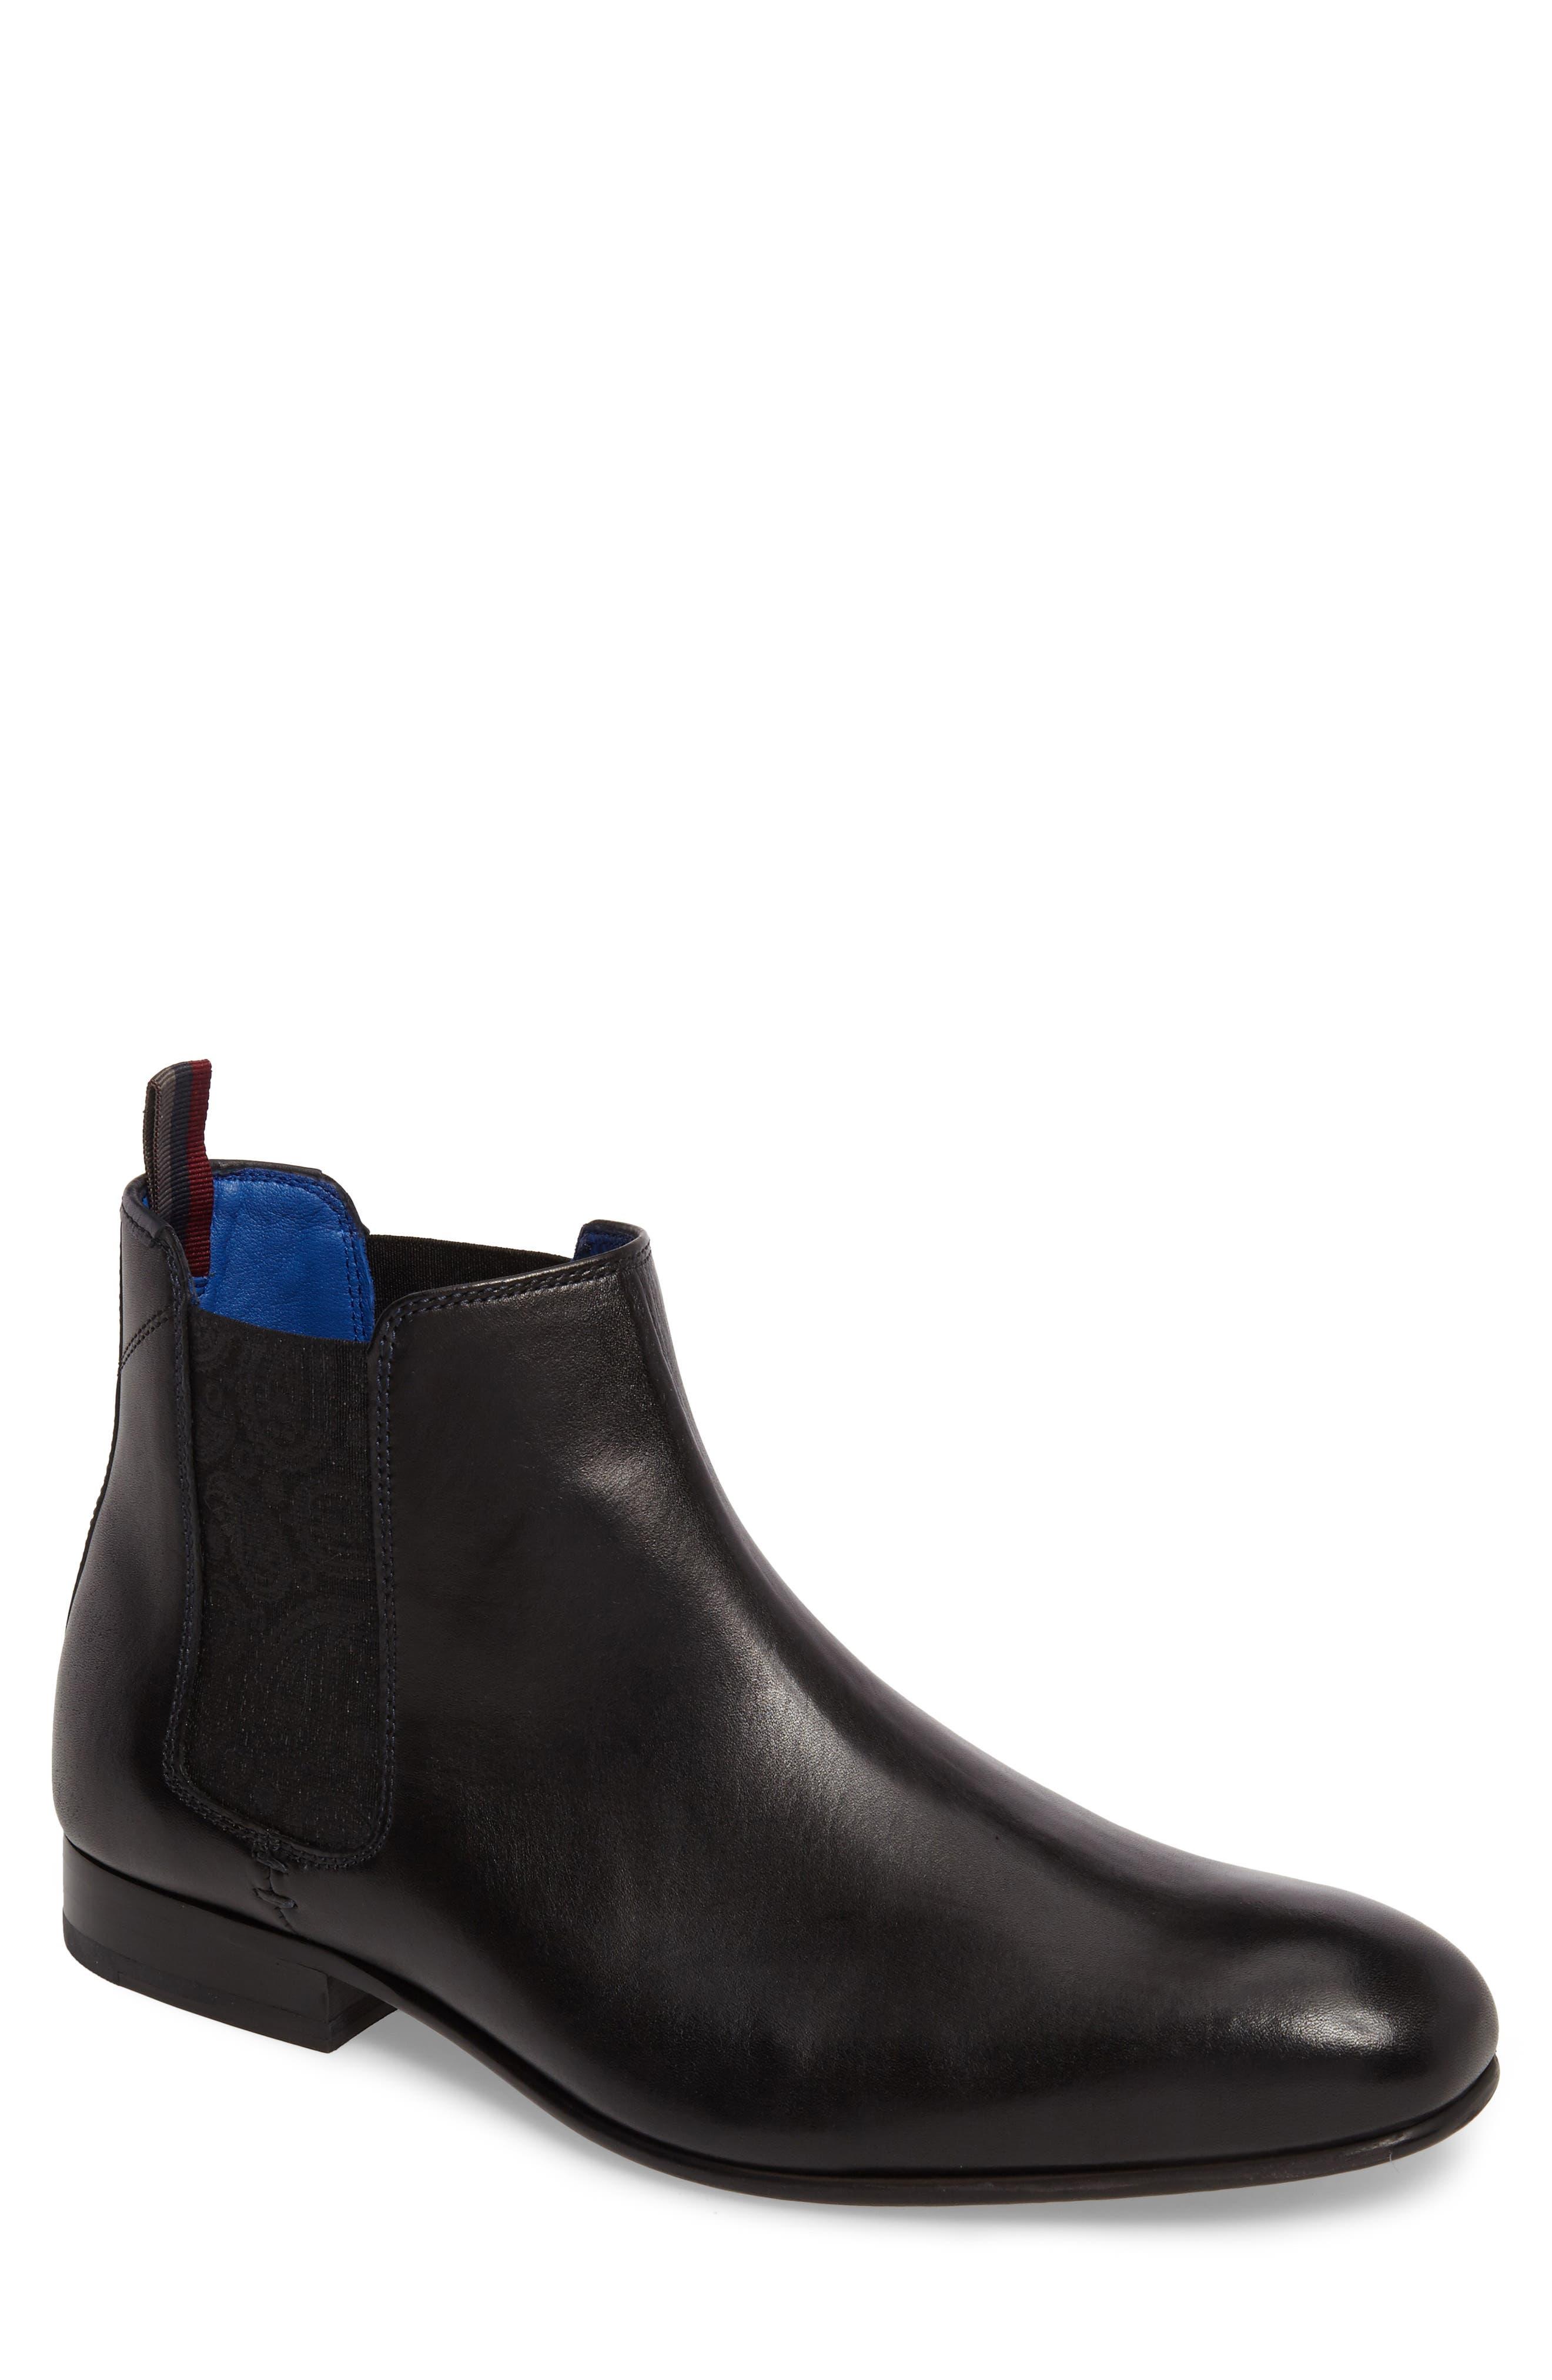 Kayto Chelsea Boot,                             Main thumbnail 1, color,                             Black Leather